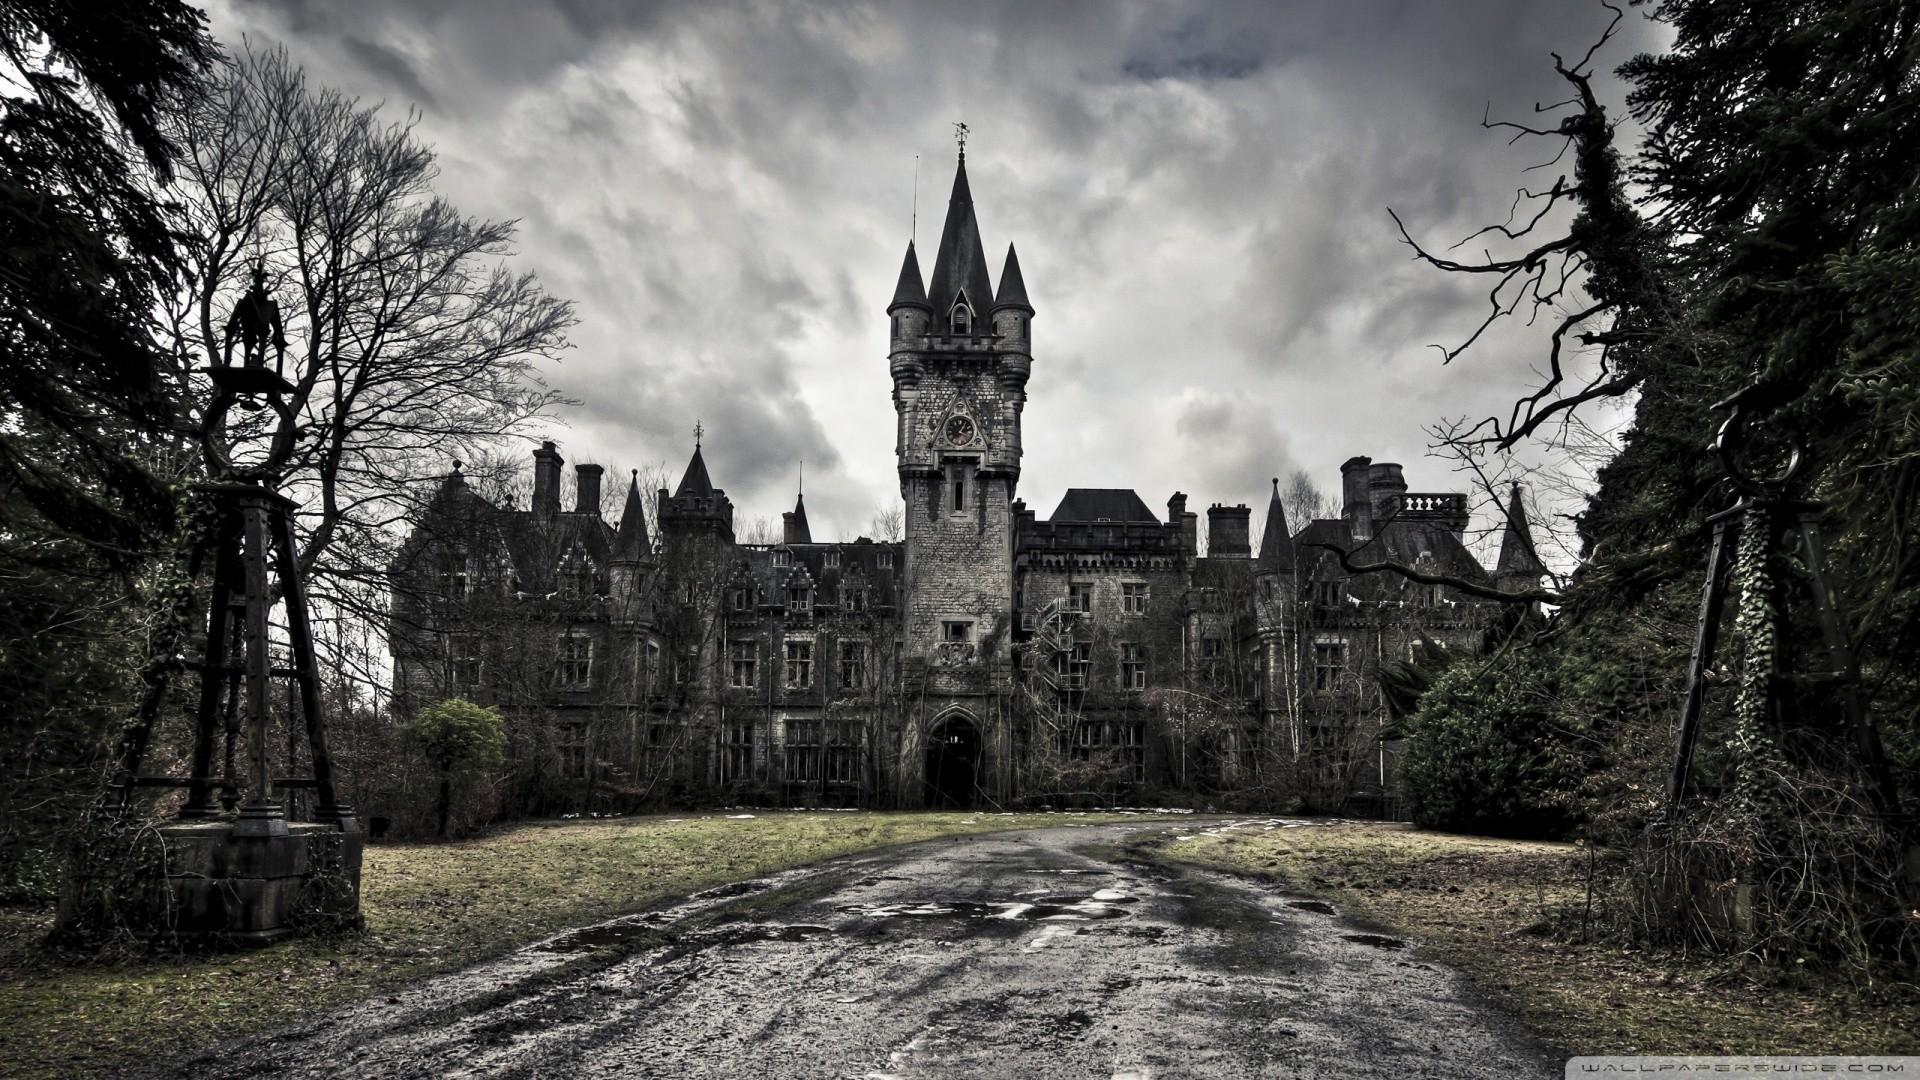 Res: 1920x1080, Spooky Castle Wallpaper